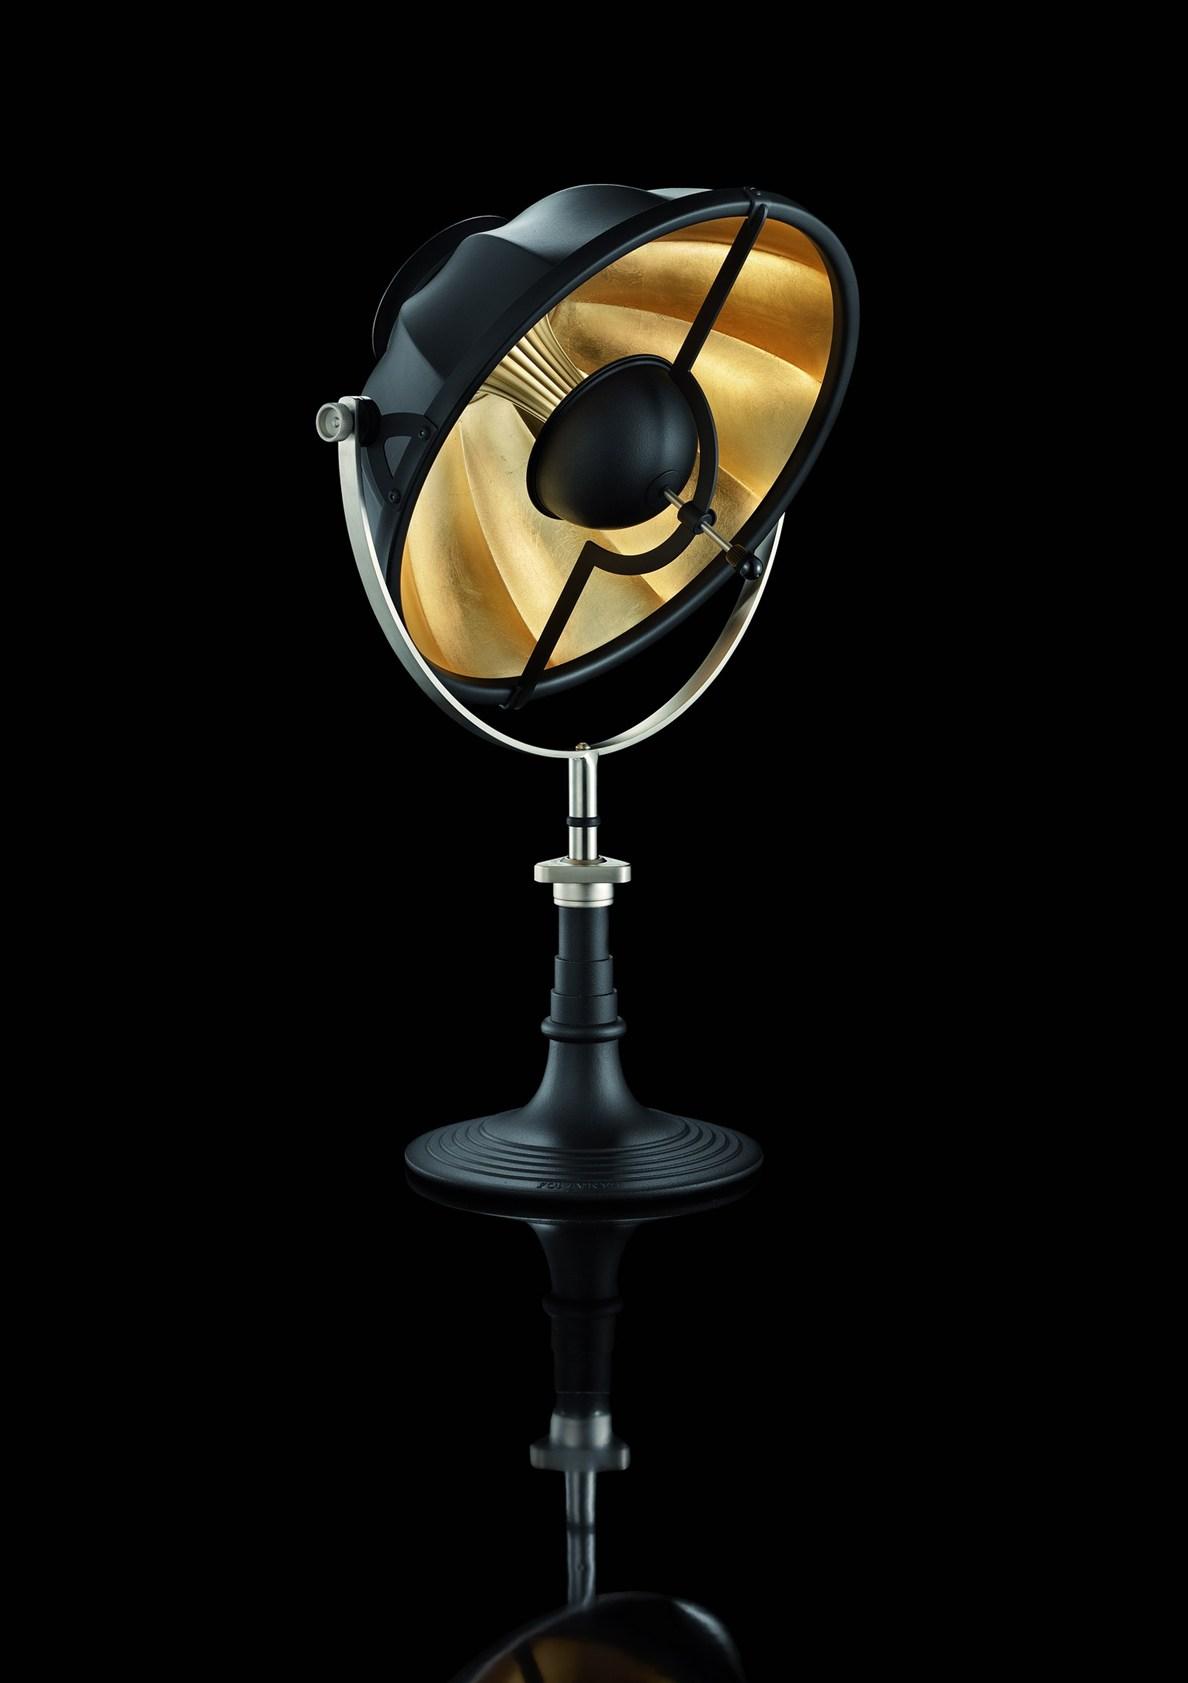 47406_08 Maison & Object 2015: Venetia Studium Maison & Object 2015: Venetia Studium 47406 08